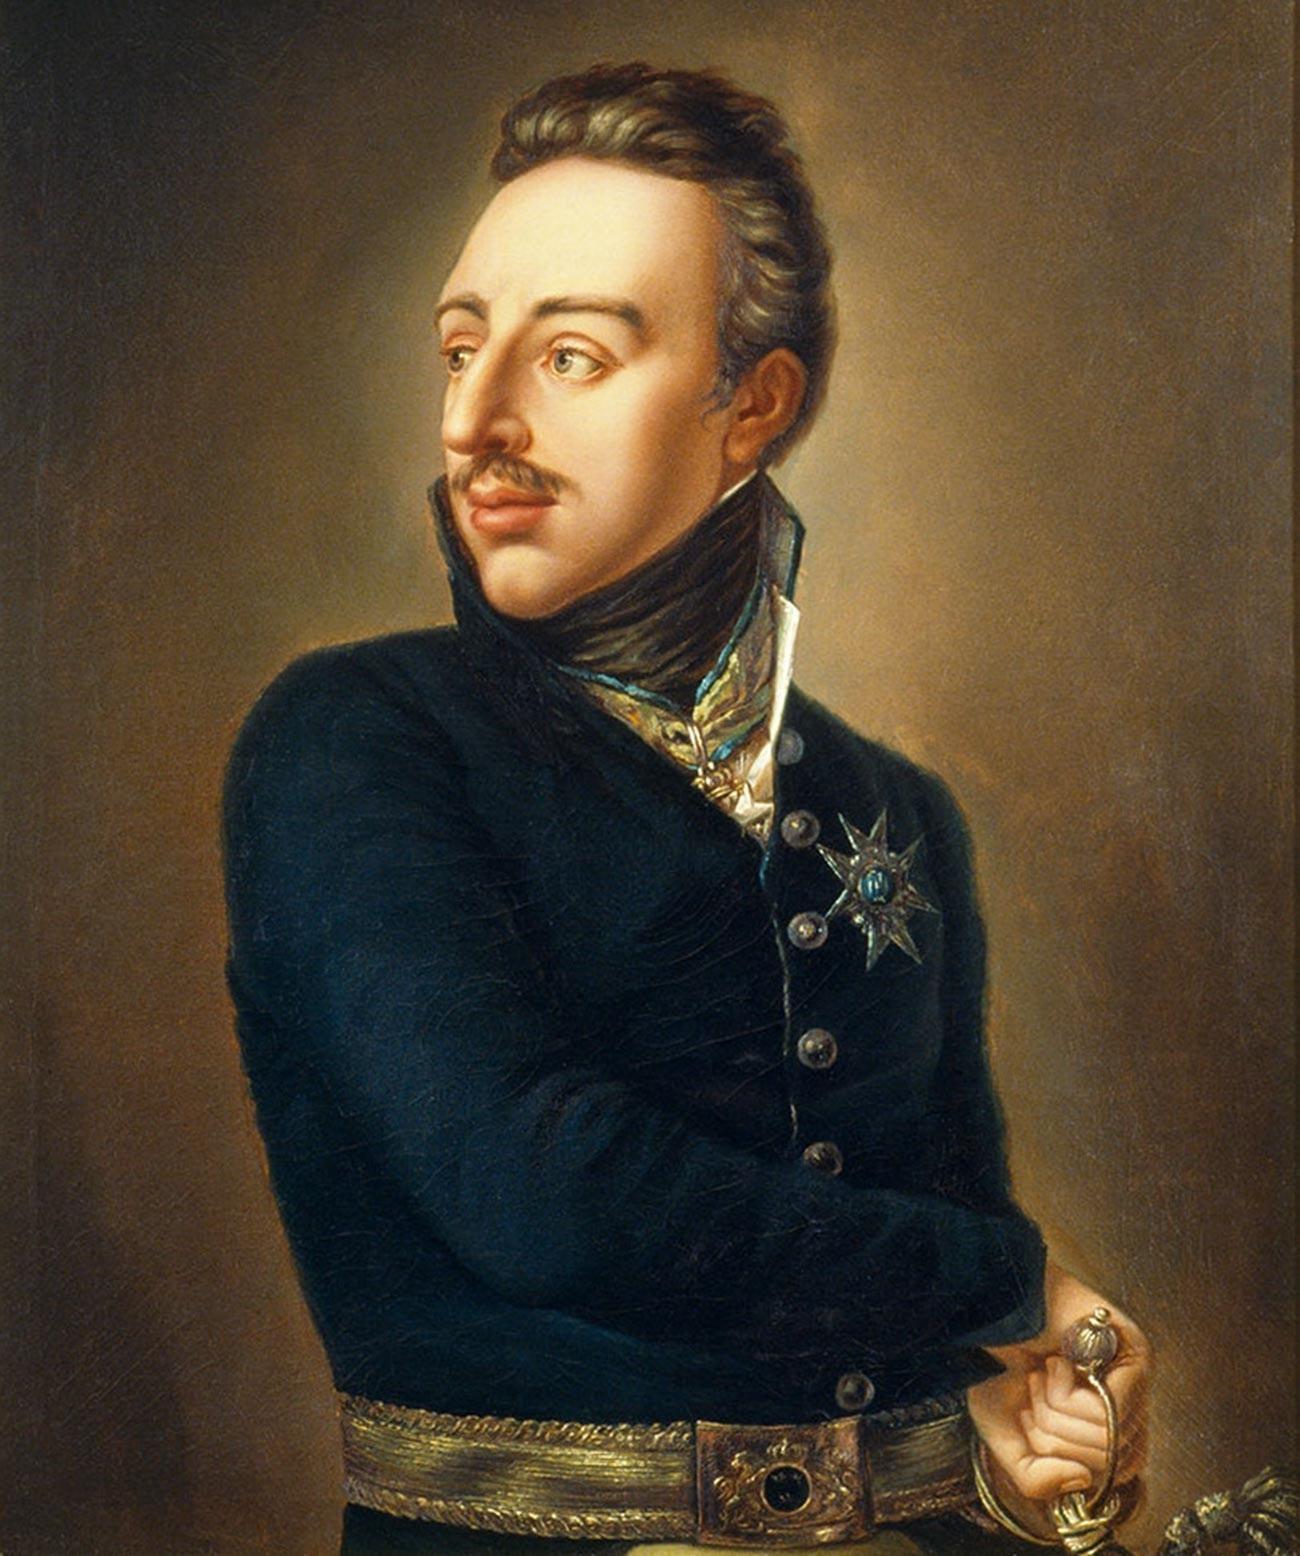 Gustavo 4º Adolfo